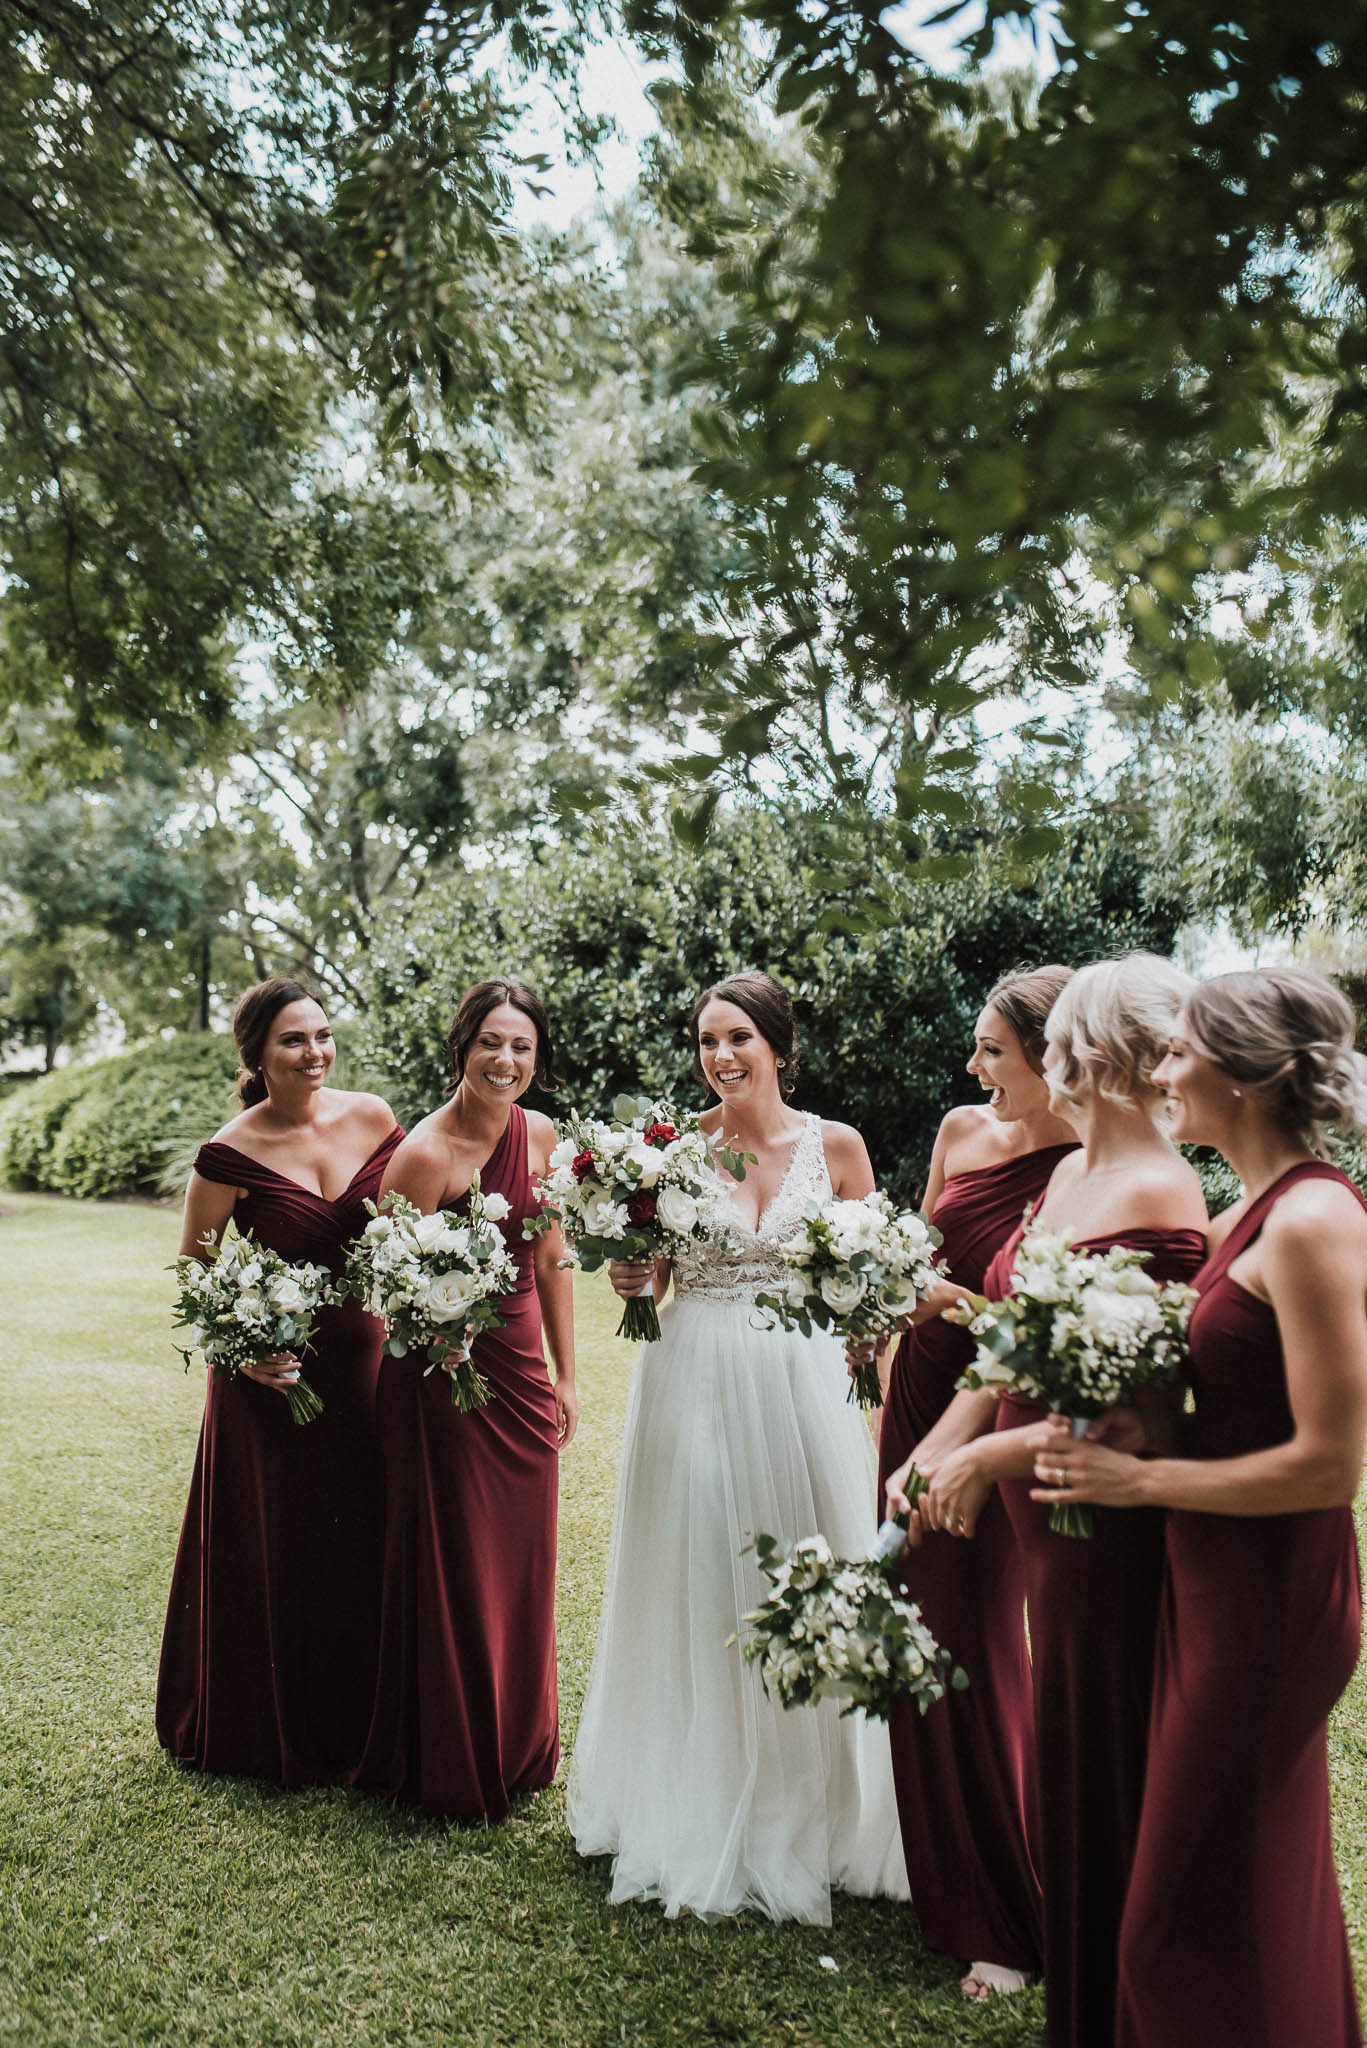 MECURE-RESORT-WEDDING-KING-WEB-253.jpg